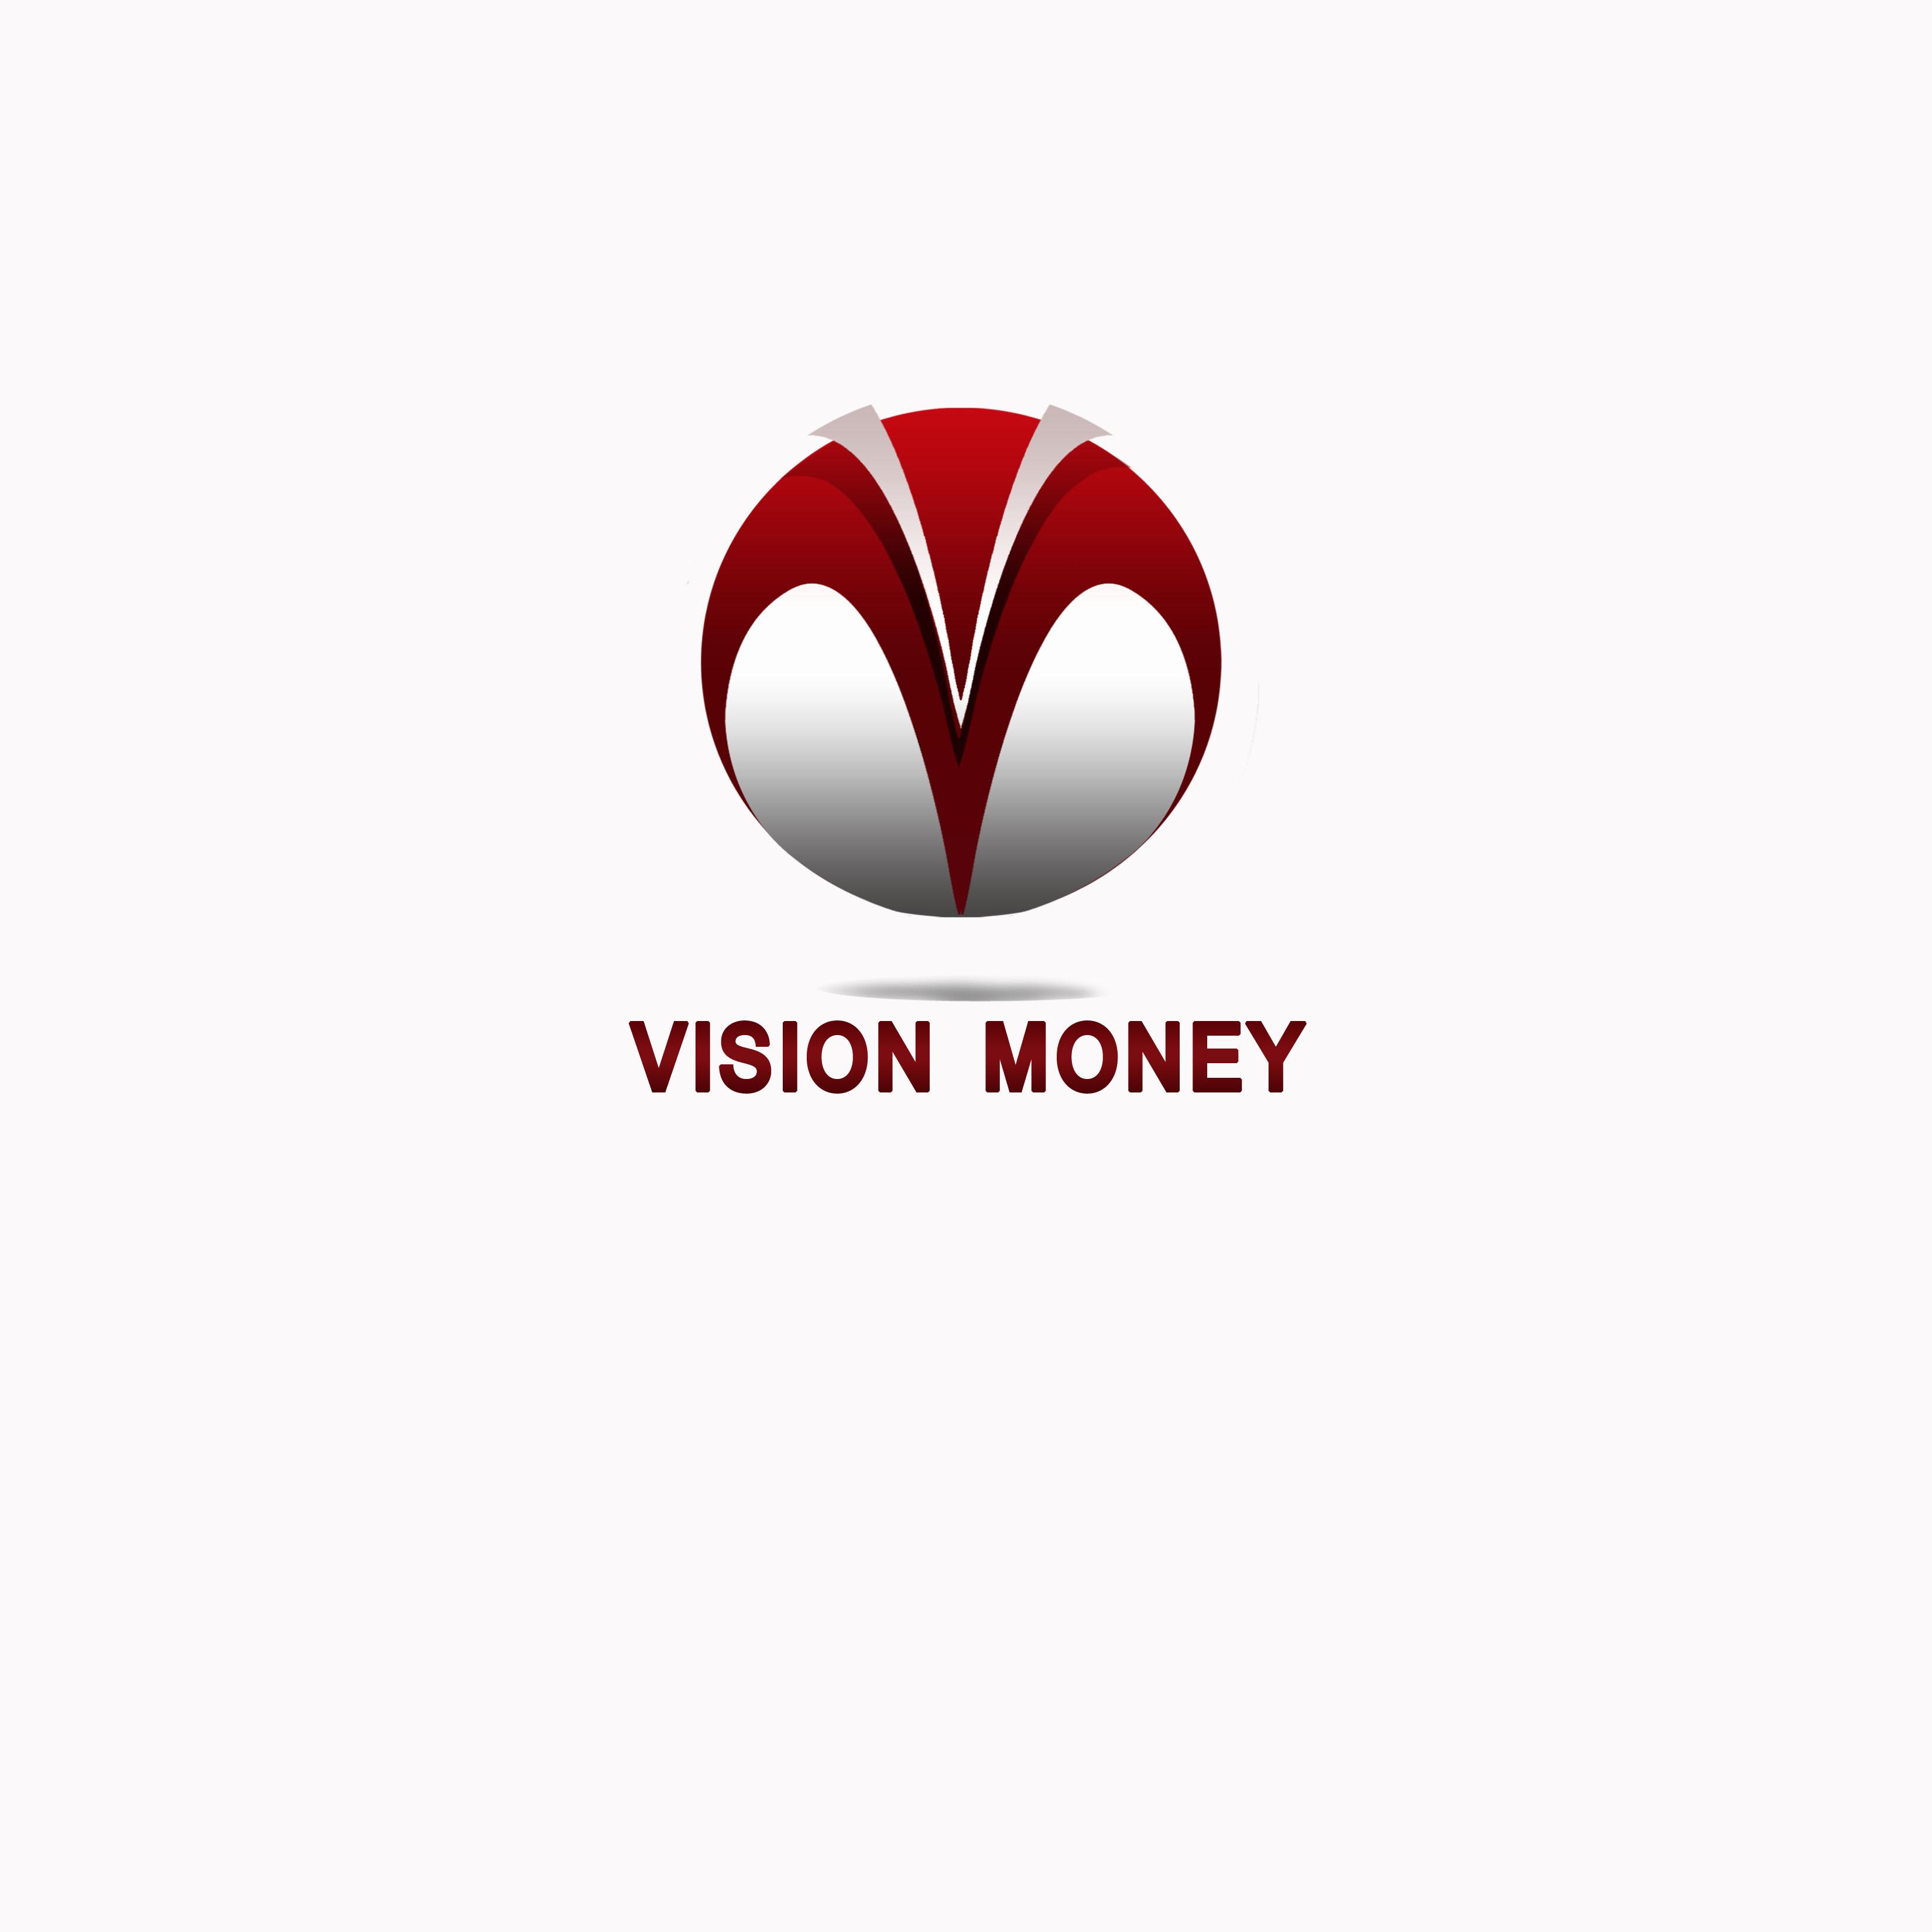 Logo Design by Allan Esclamado - Entry No. 24 in the Logo Design Contest Captivating Logo Design for VISION MONEY.